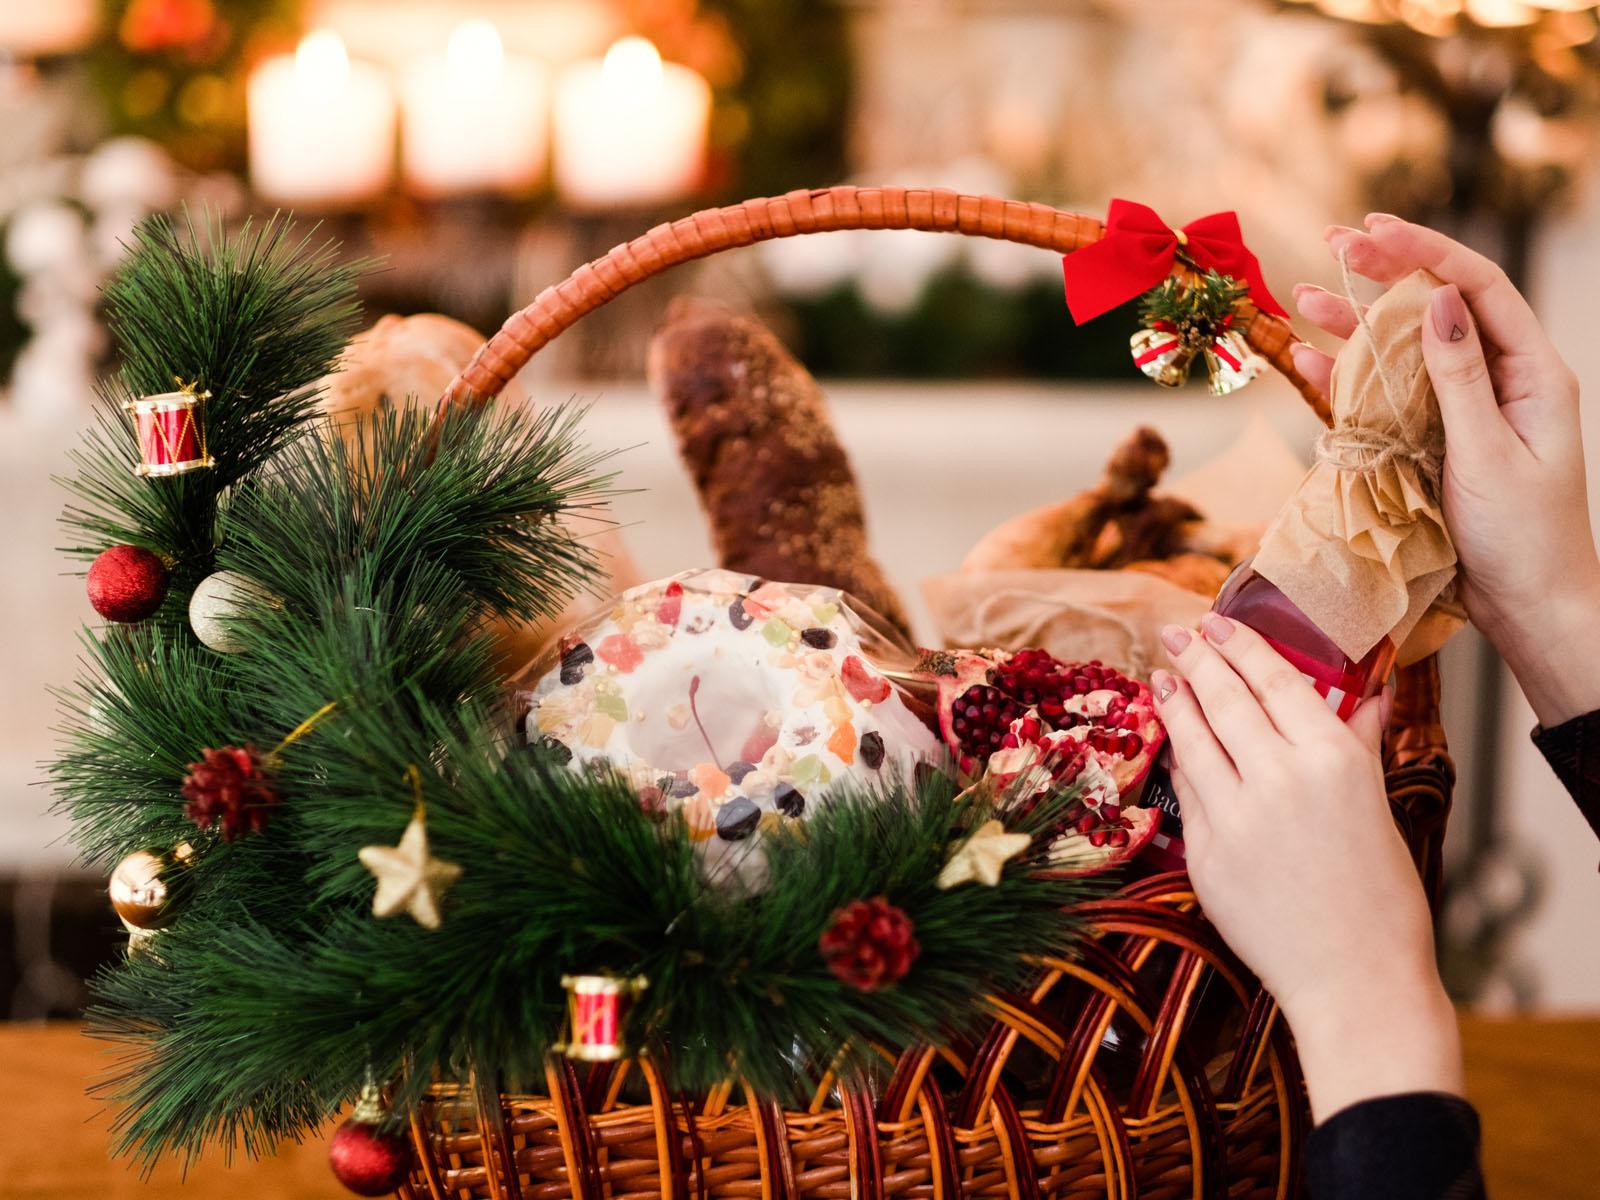 Idee Regalo Dolci Natale.Regali Di Natale Fai Da Te In Cucina Migliori Ricette Regali Di Natale Culinari Donna Moderna